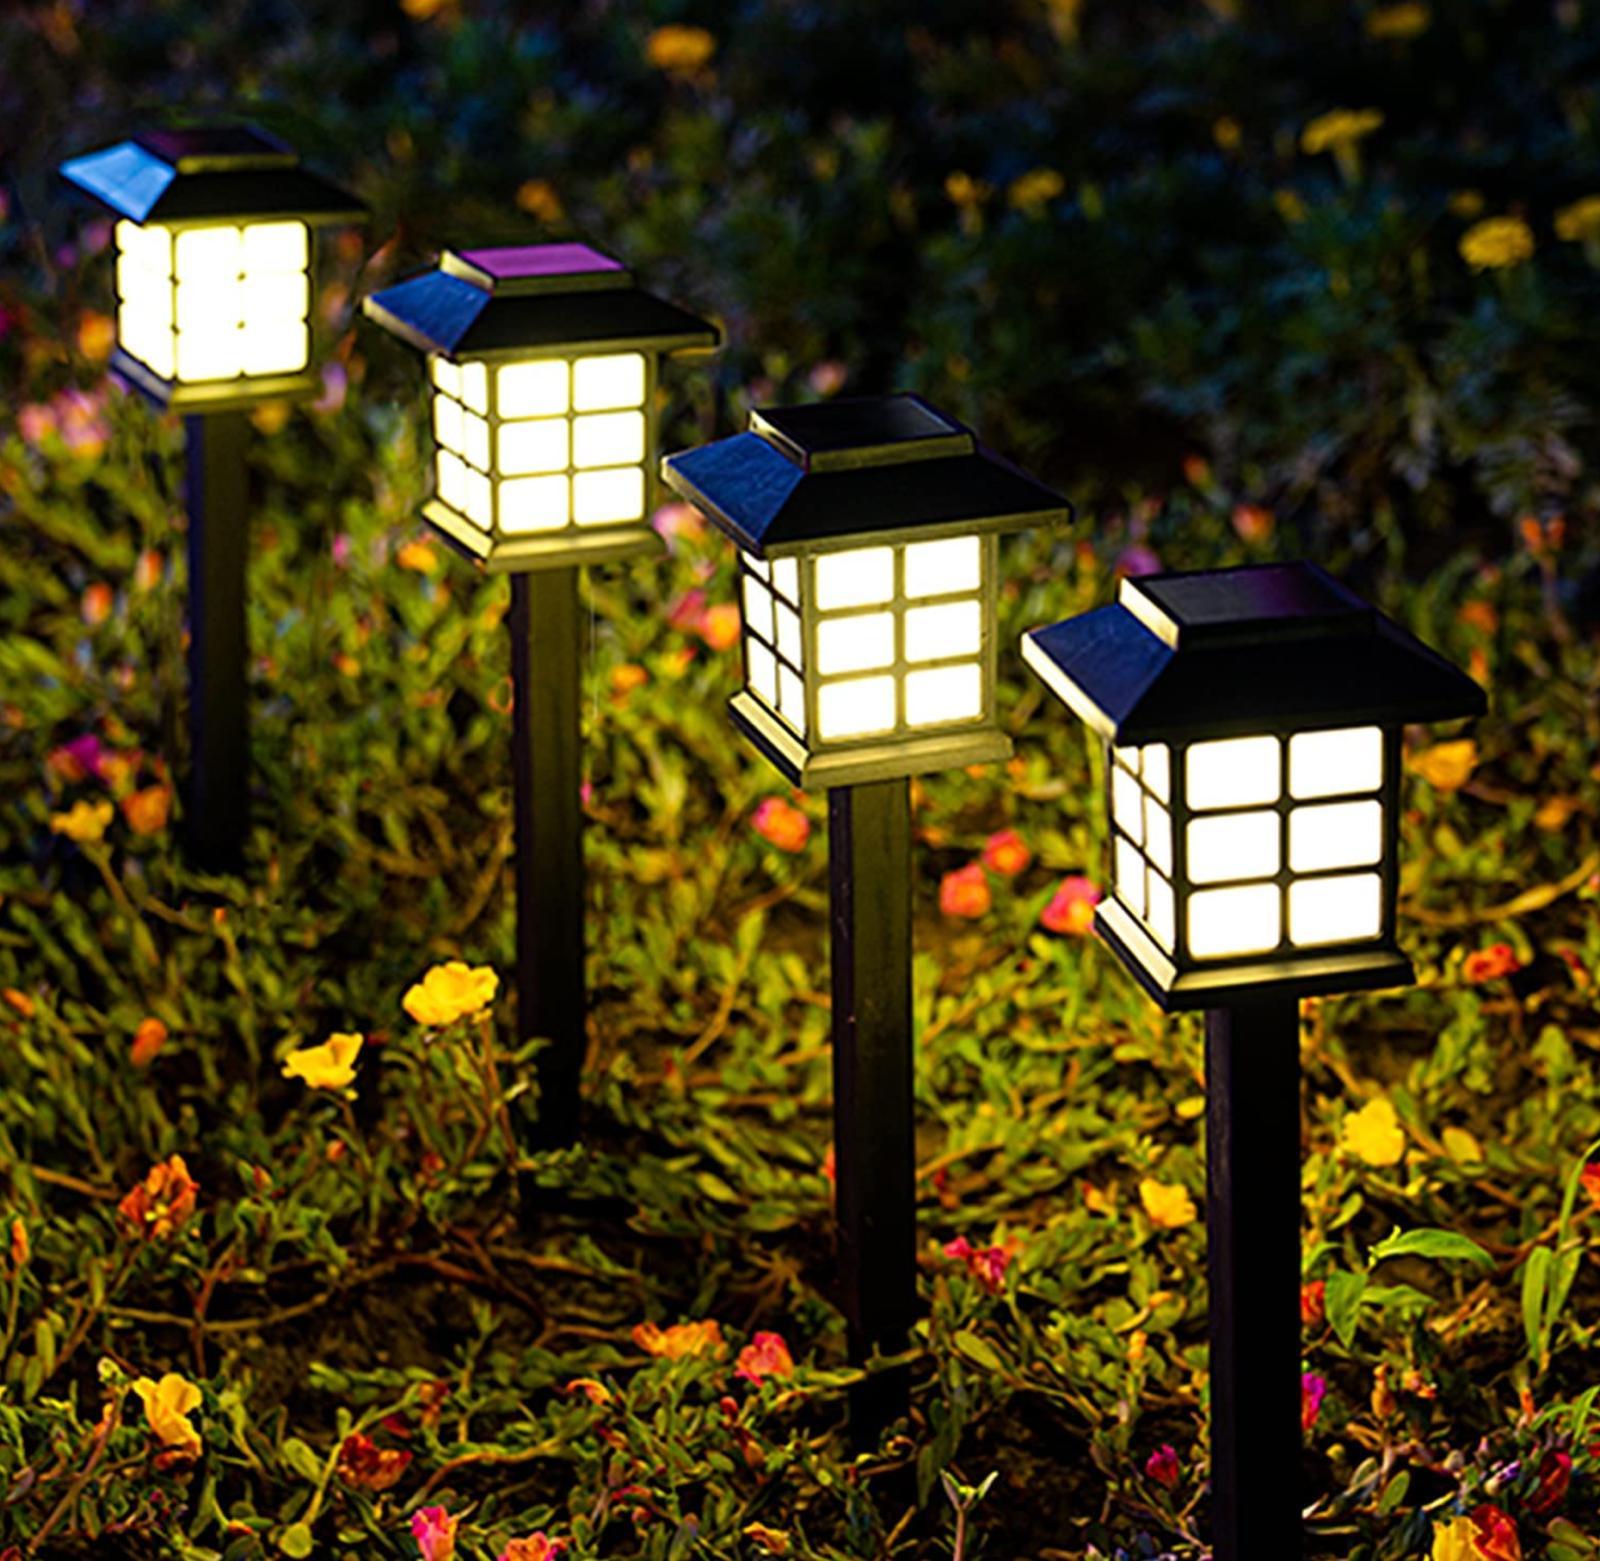 GIGALUMI 8 LED Solar Lights Waterproof